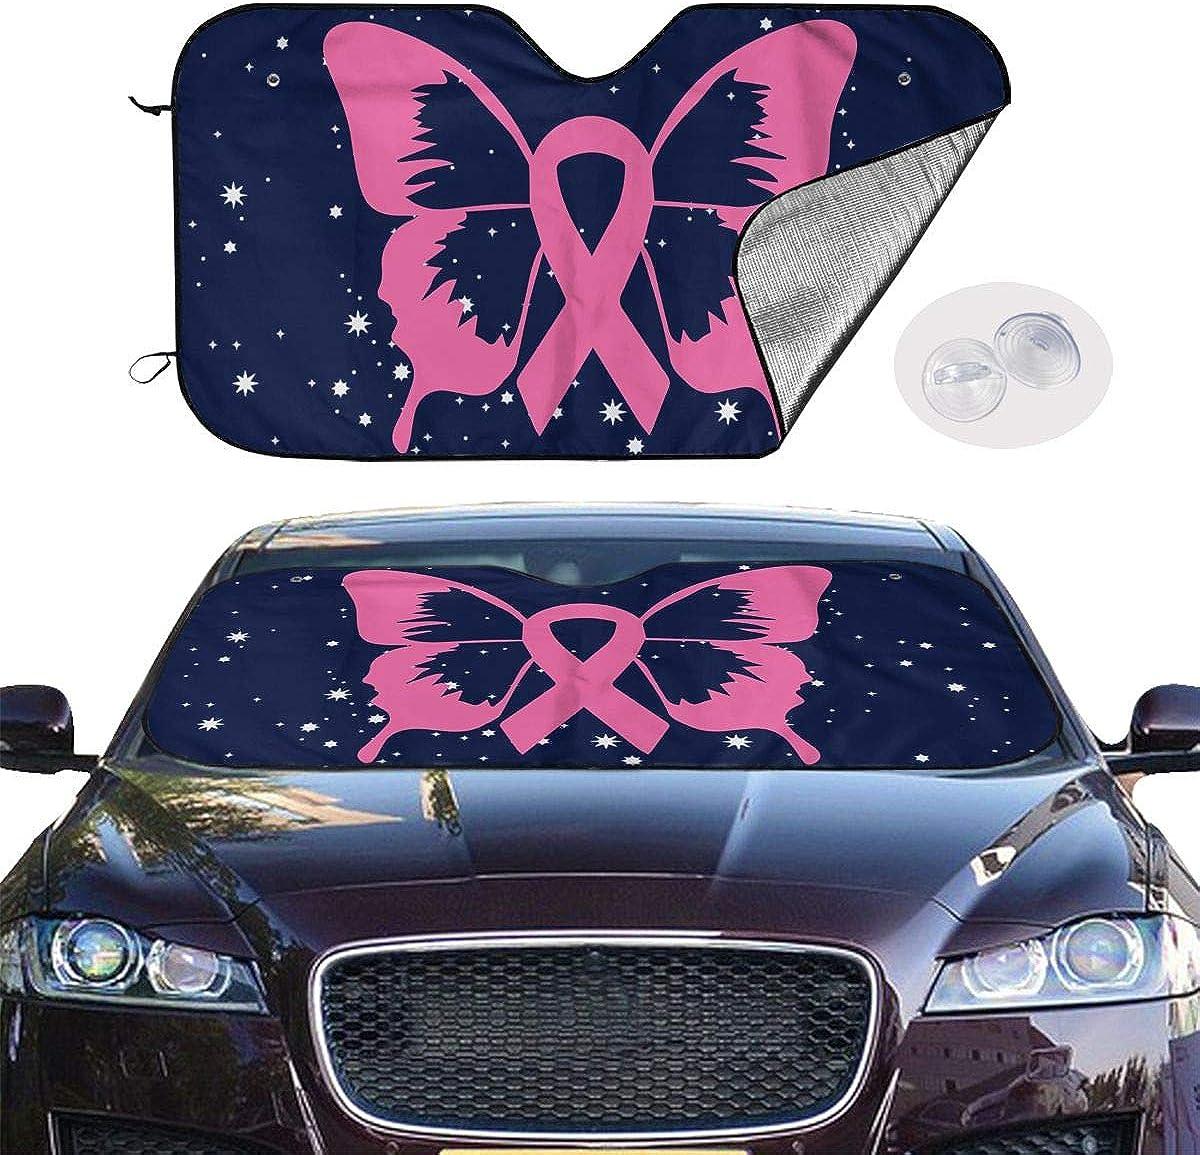 BAG9S-G1 Breast Cancer Awareness Ribbon Survivor Car Windshield Sunshade Foldable Sunshade for Car SUV Trucks Minivans Sunshades Cools Vehicle Interior